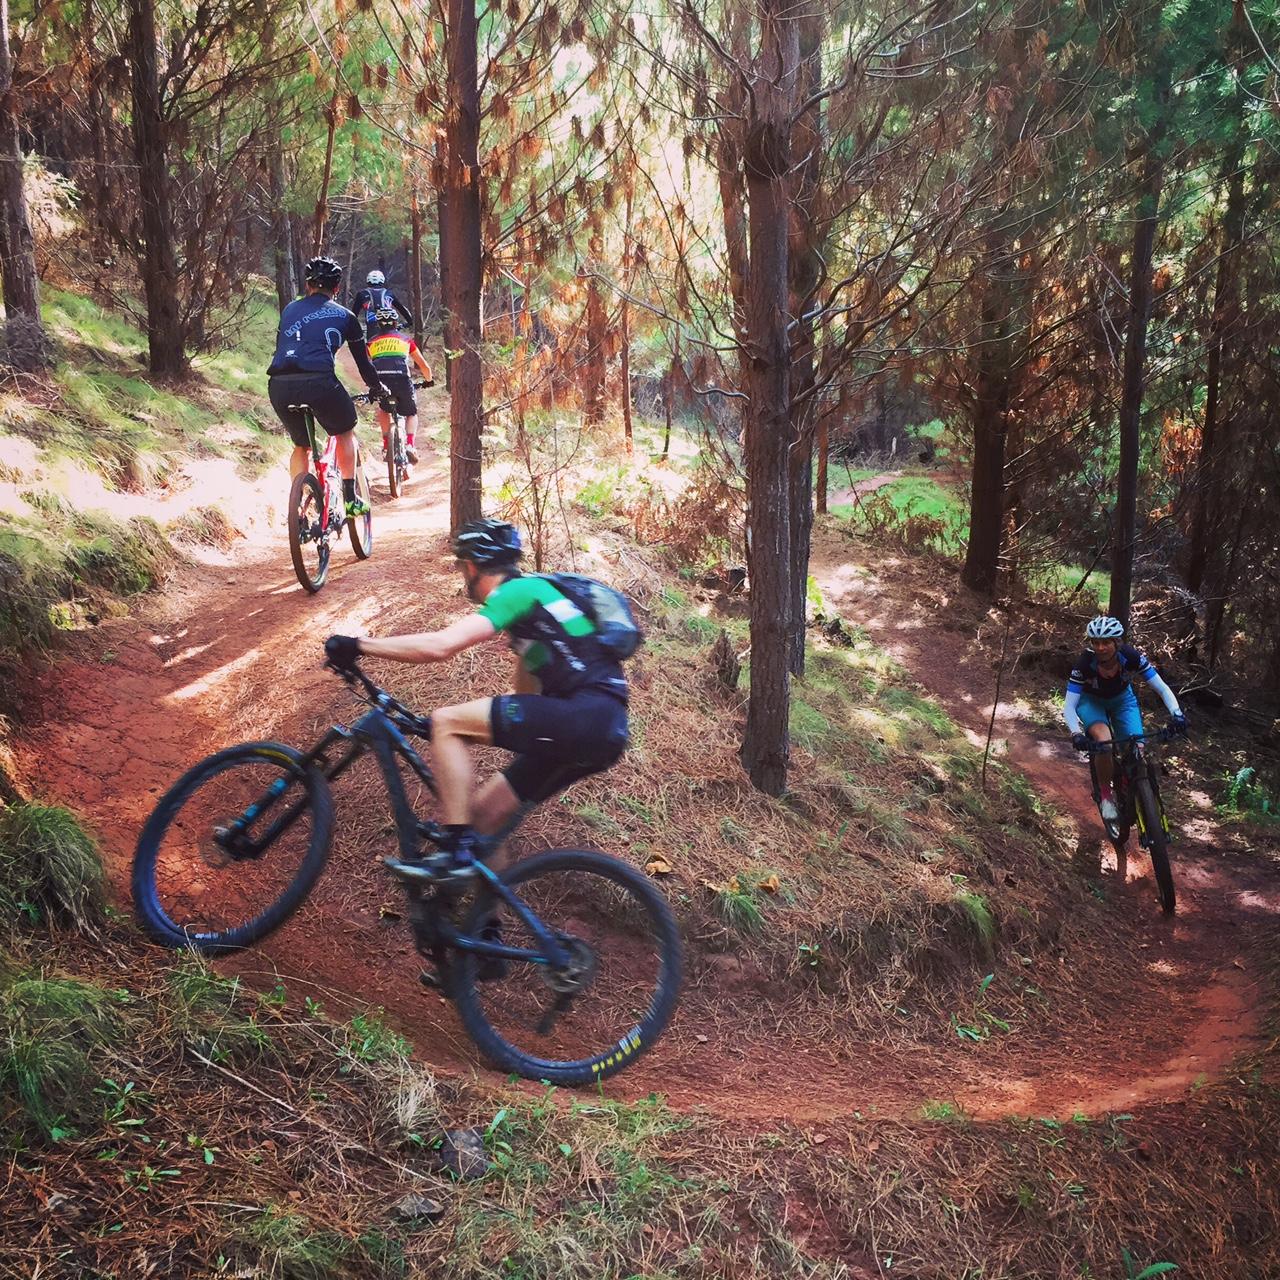 Mountain biking in Bright